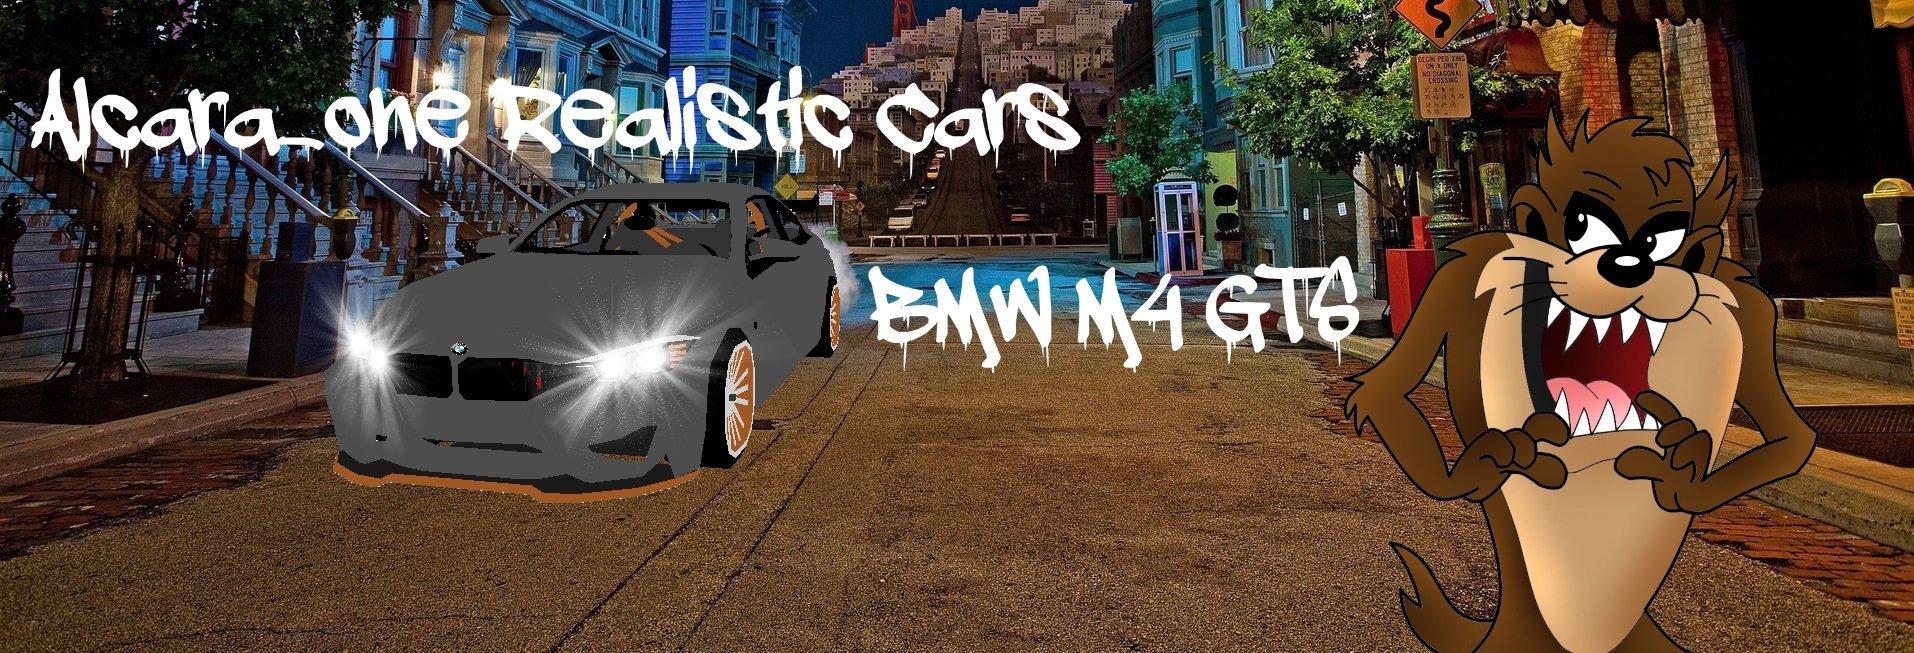 BMW M4 GTS Alcara_one